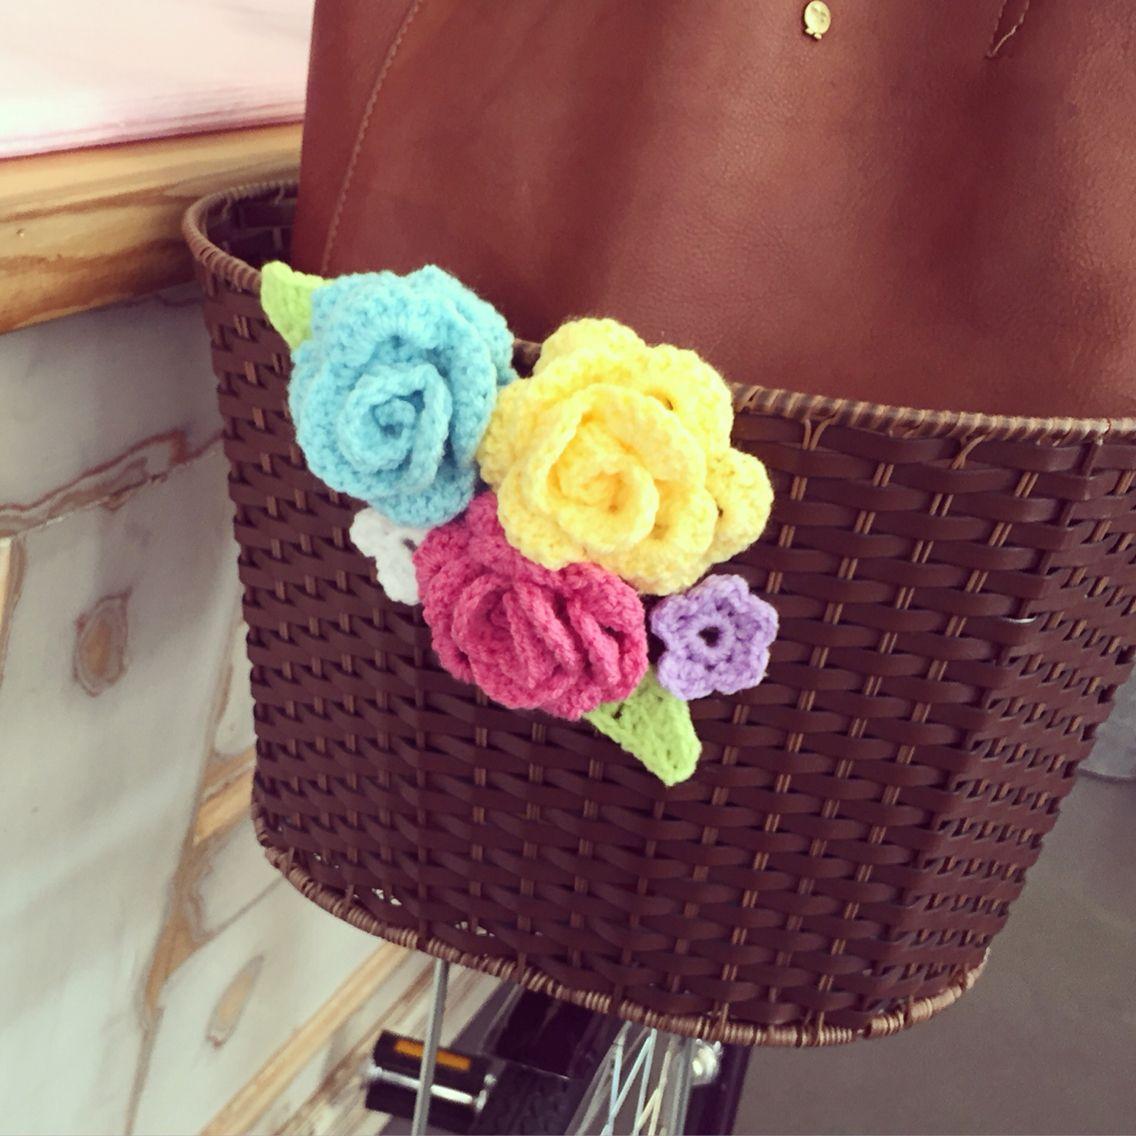 Crochet flowers bike basket | Crochet, Knitting and Yarn ...